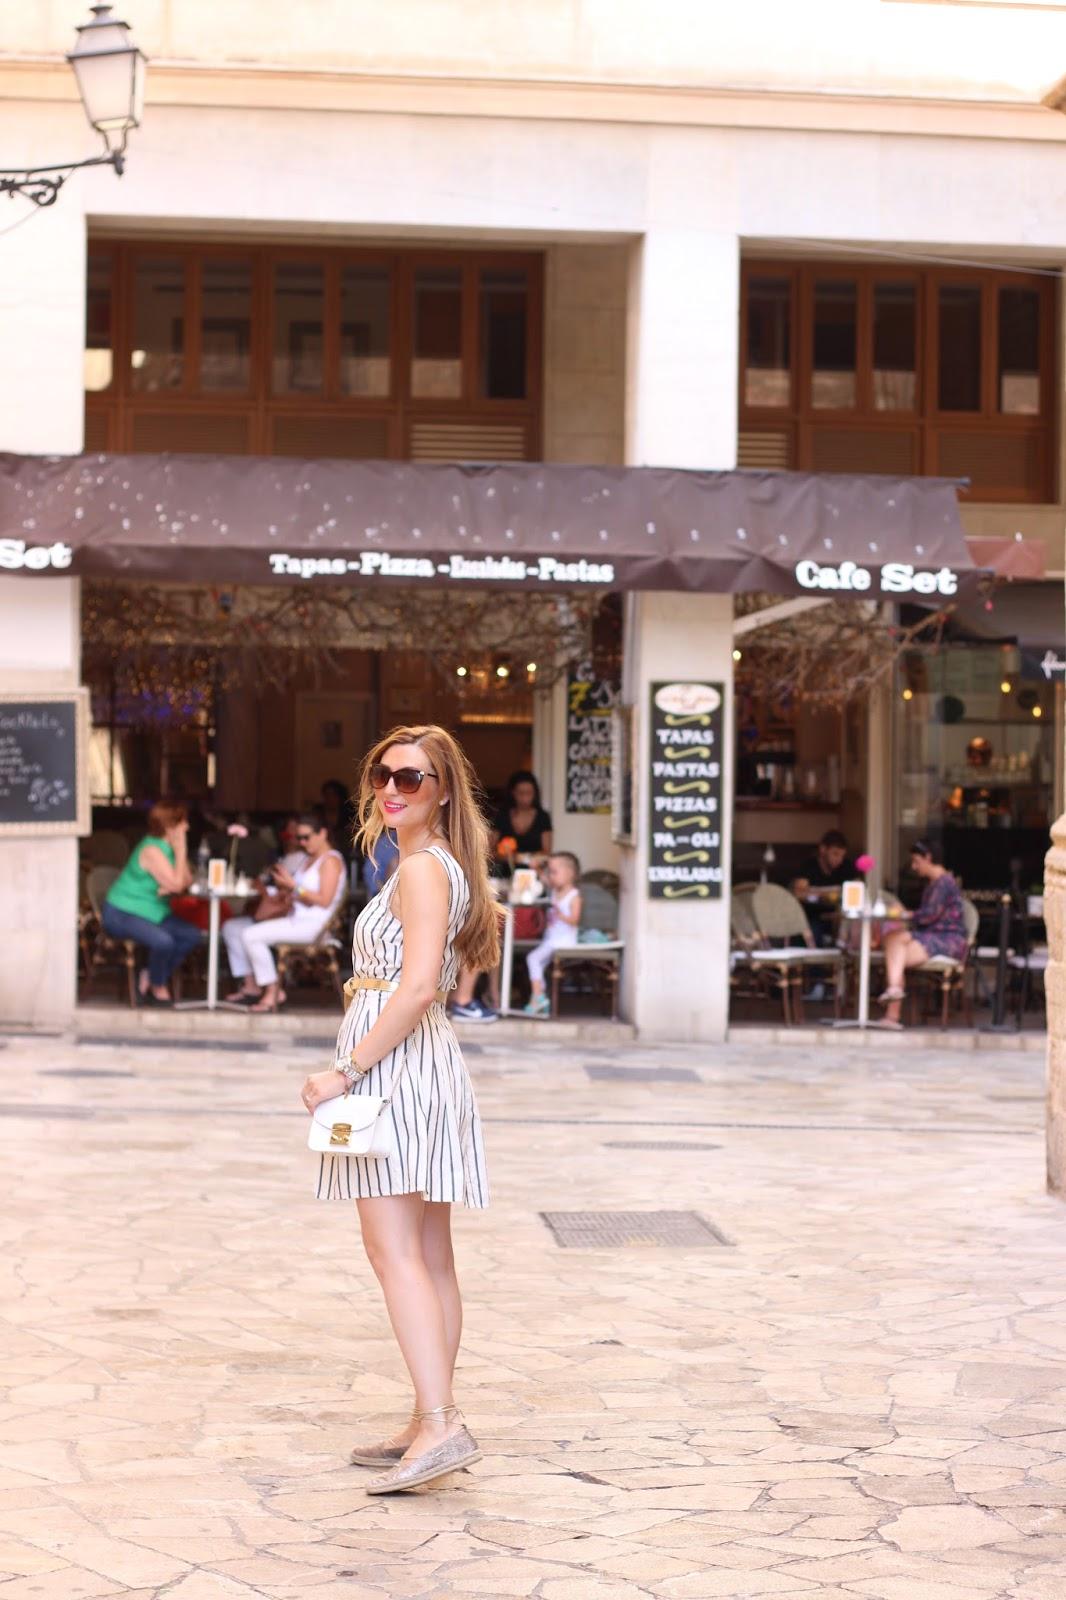 Blogger aus Frankfurt - Frankfurt Fashion Blogger - Fashionblogger aus Frankfurt - Deutsche Blogger .- Deutsche Fashionblogger - Fashionstylebyjohanna- Streifenkleid C&A - C&A Kleid